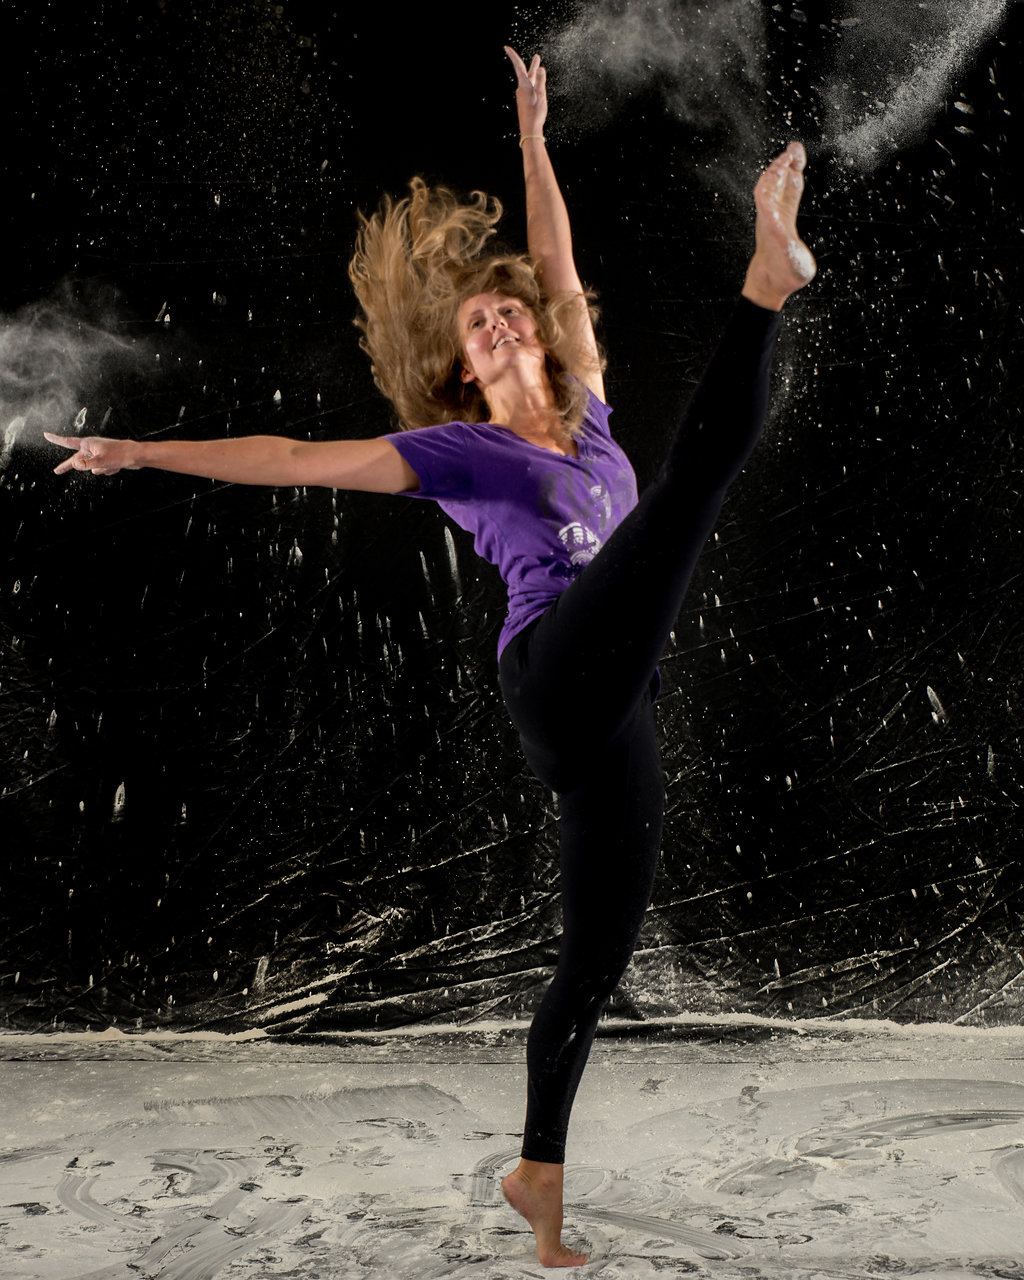 Giselle Lorenz Brock